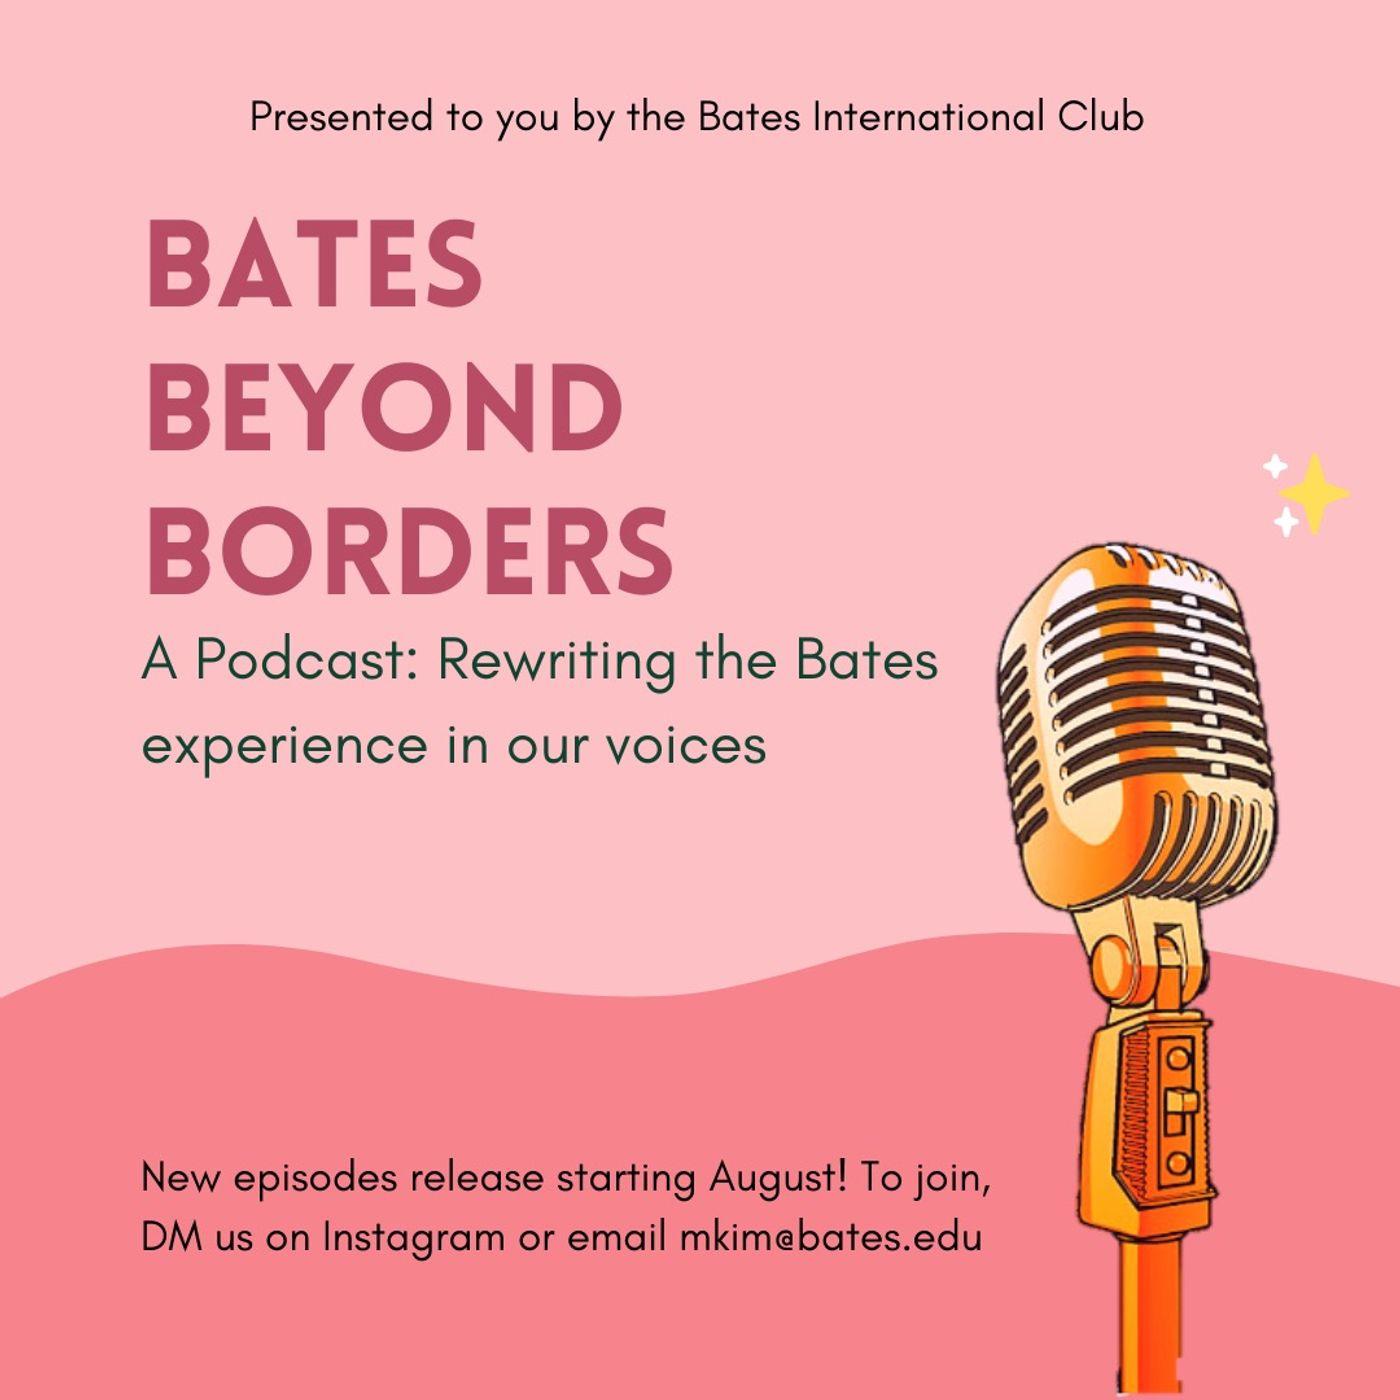 Bates Beyond Borders